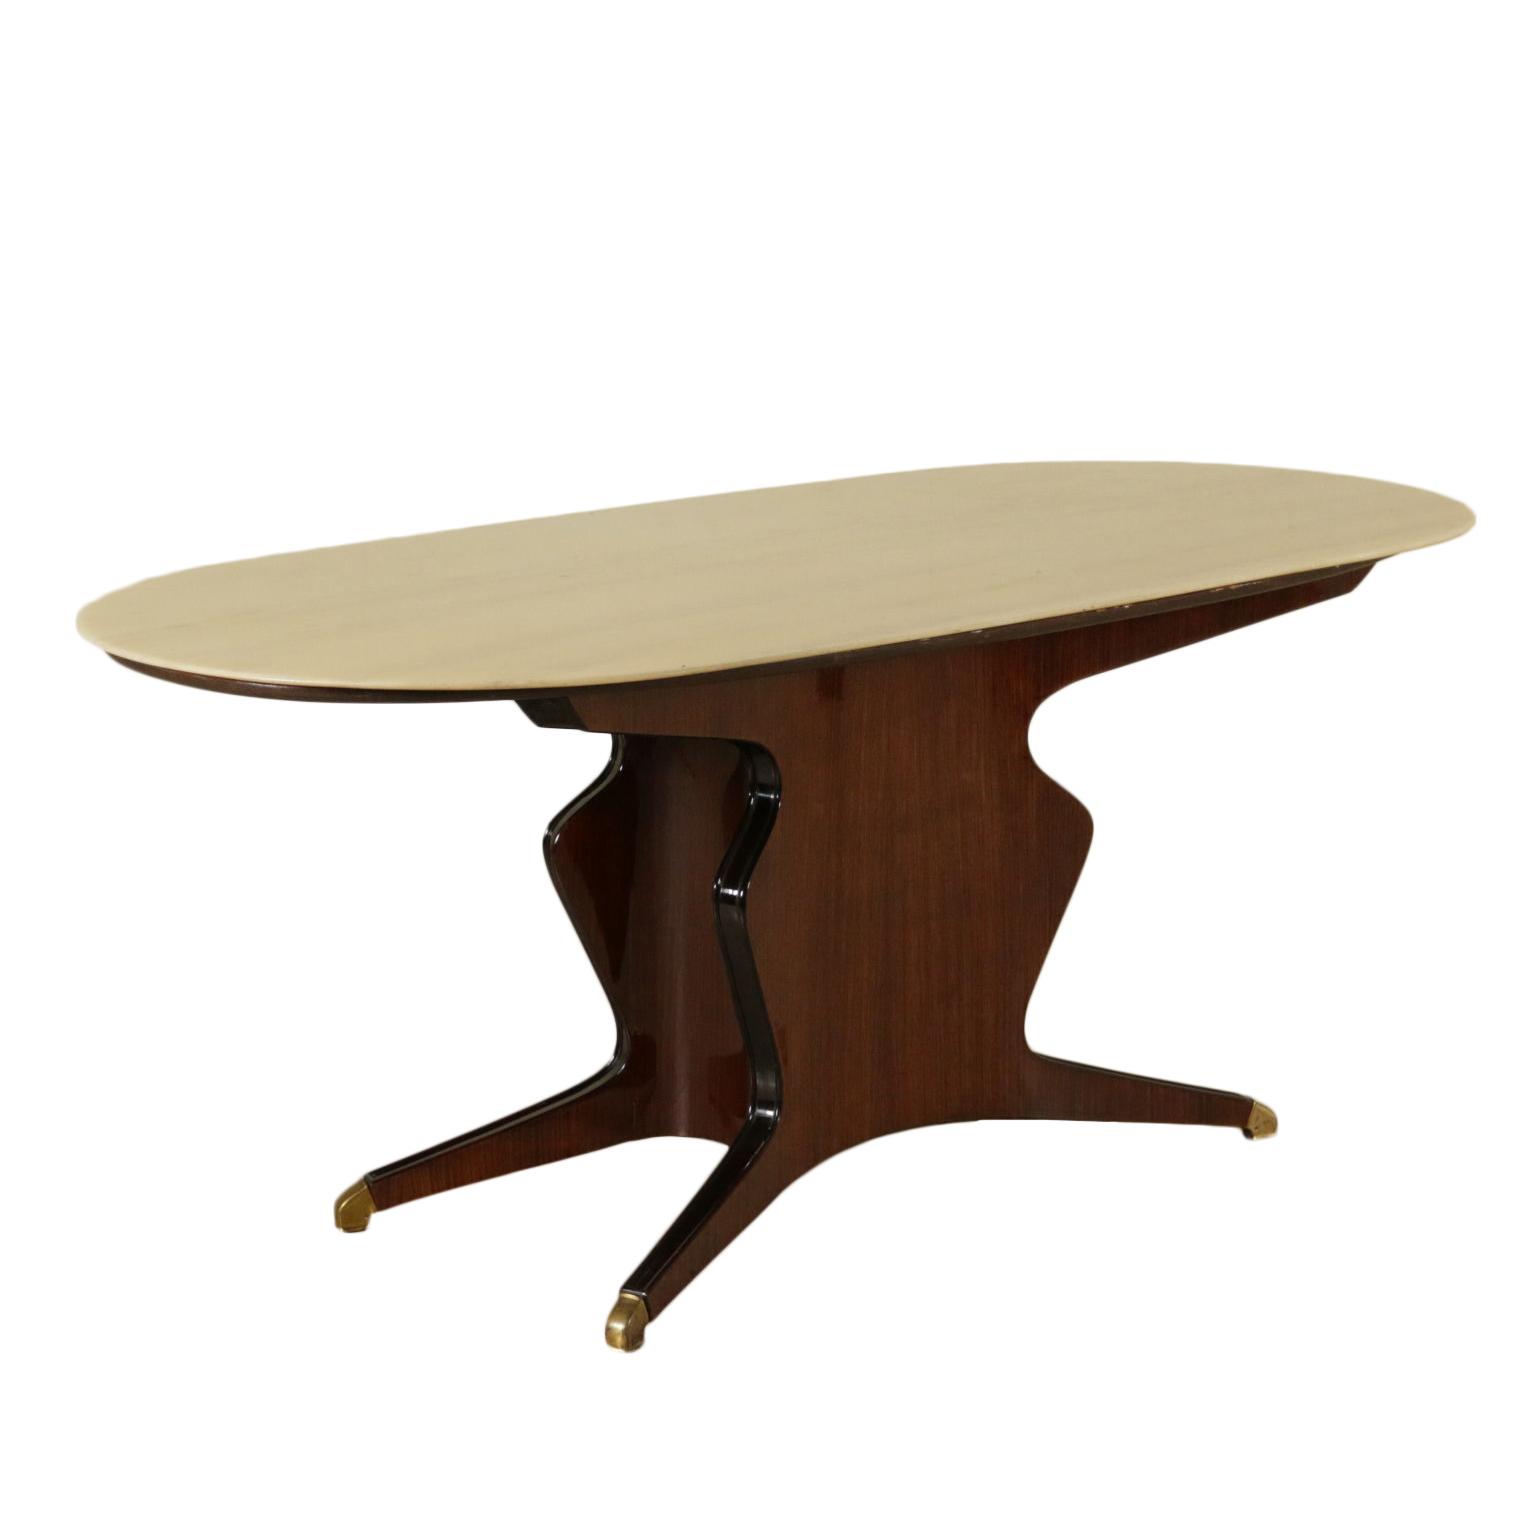 Tavolo osvaldo borsani tavoli modernariato for Negozi tavoli milano